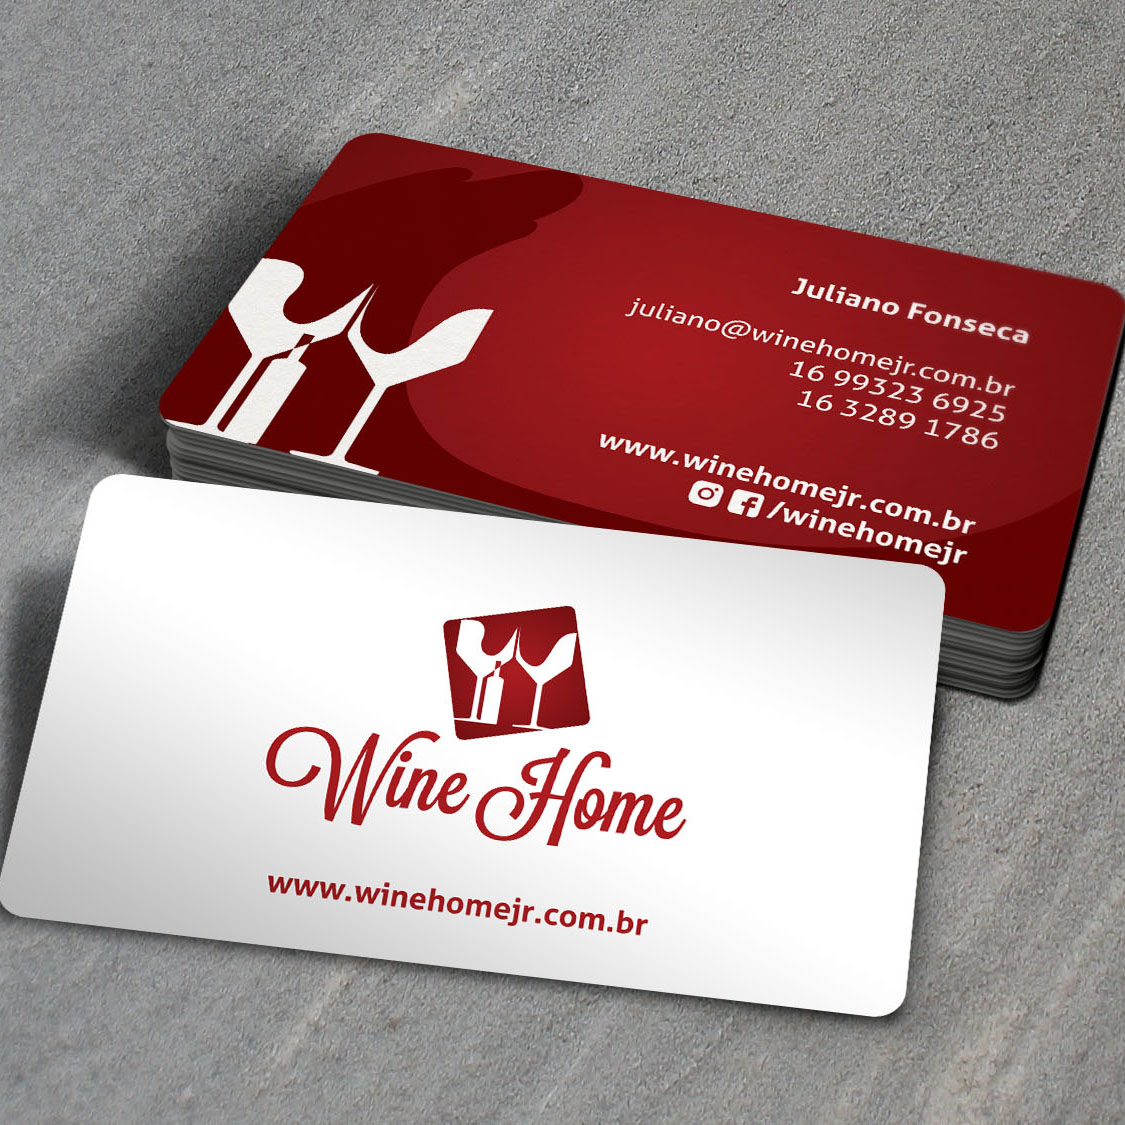 Identidade Corporativa - Wine Home